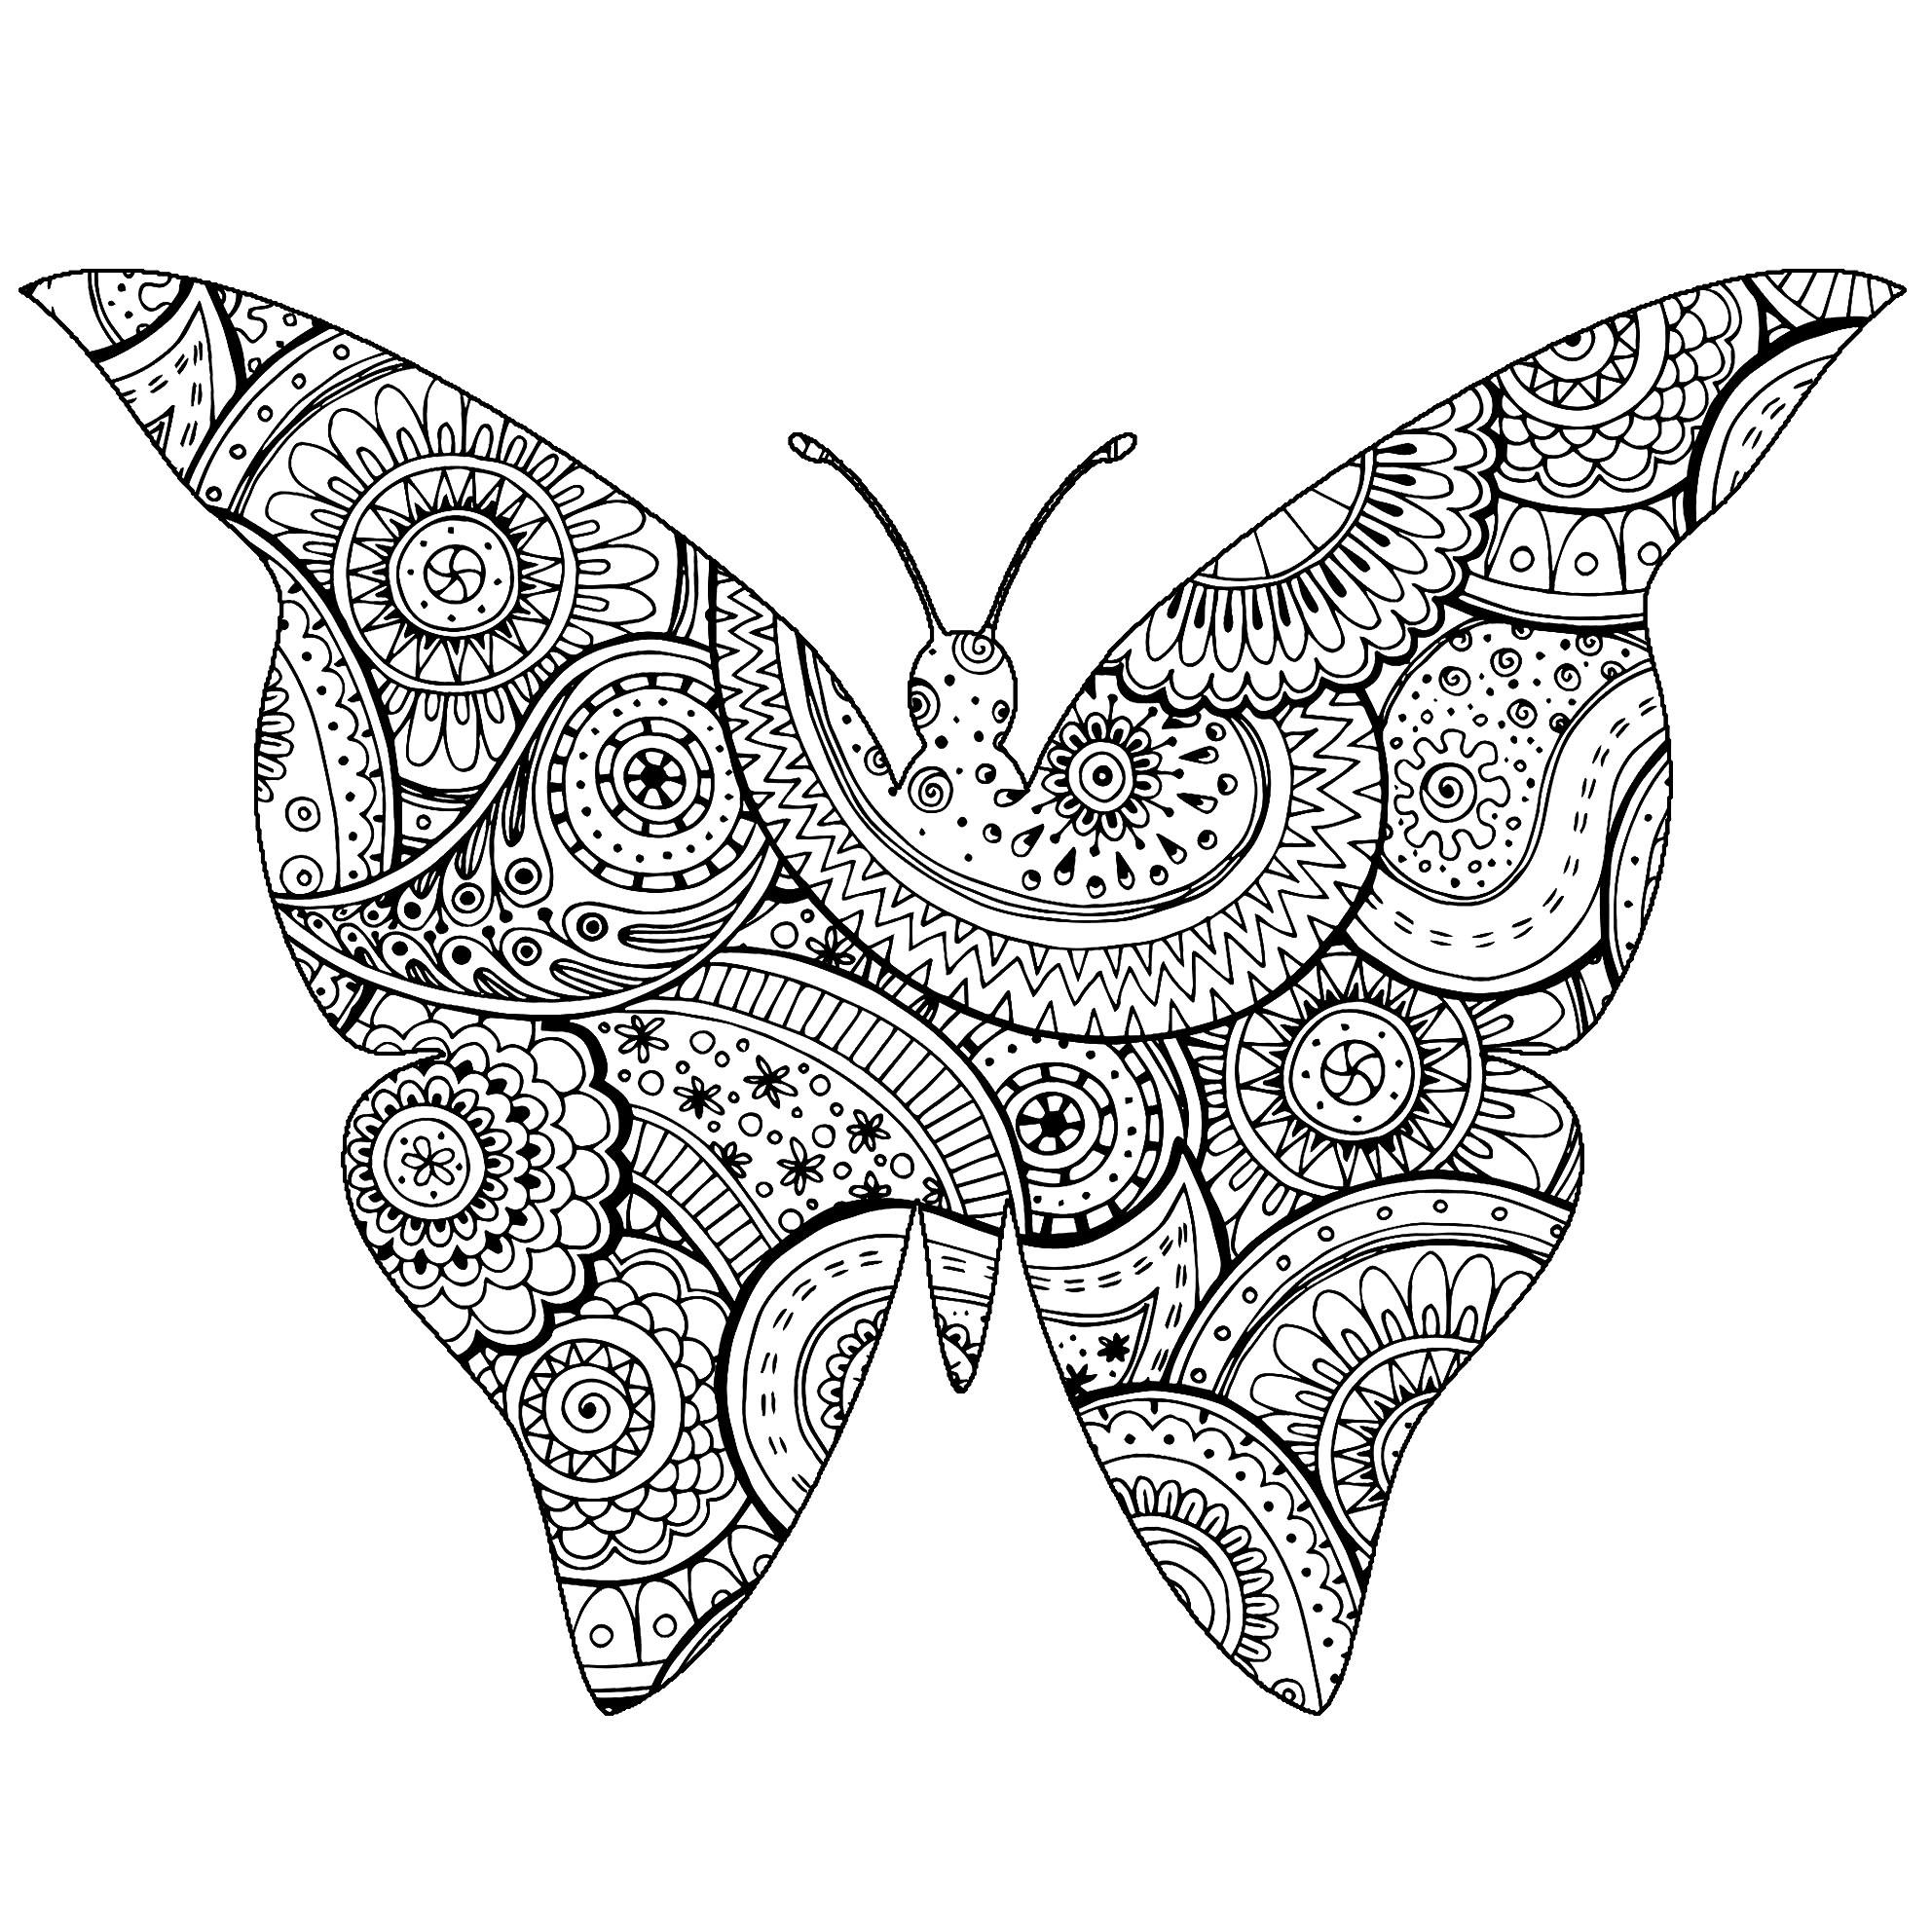 Mariposas E Insectos 9428 Mariposas E Insectos Colorear